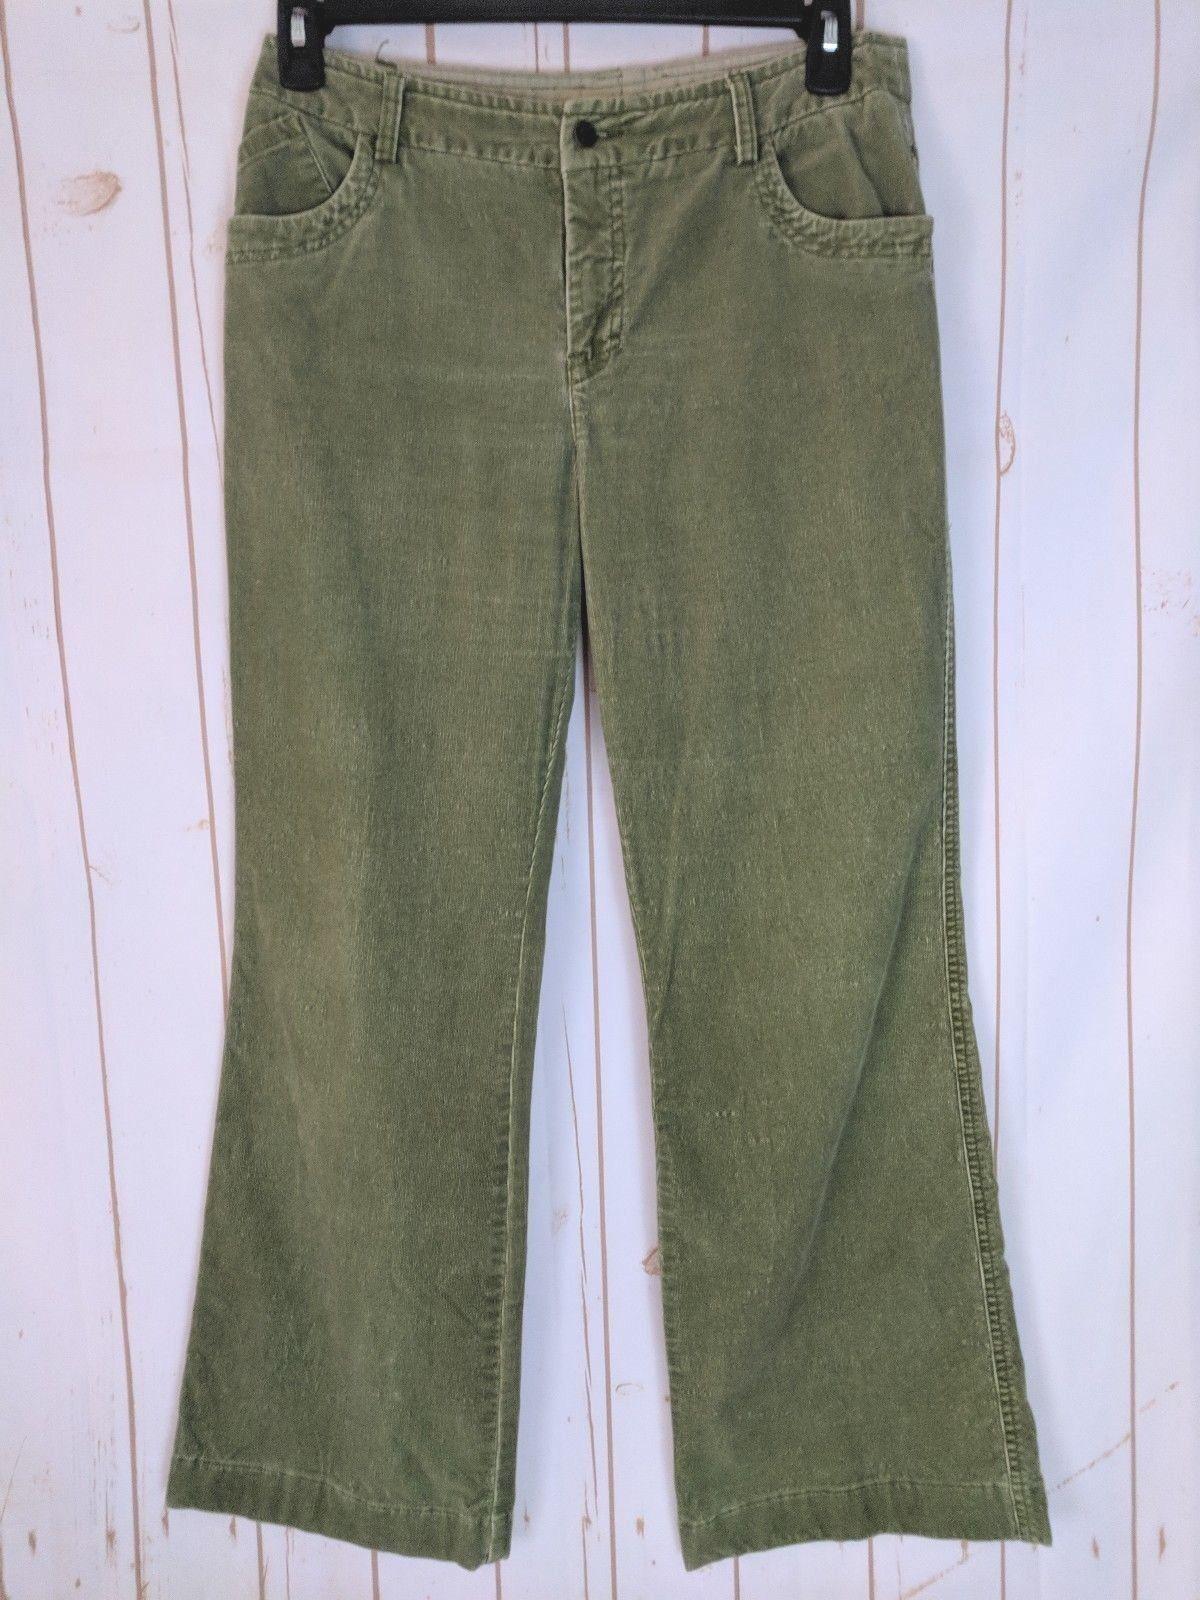 Telluride Clothing Co. Hose 12 Lt. Grün Cotton Spandex Stretch Corduroy